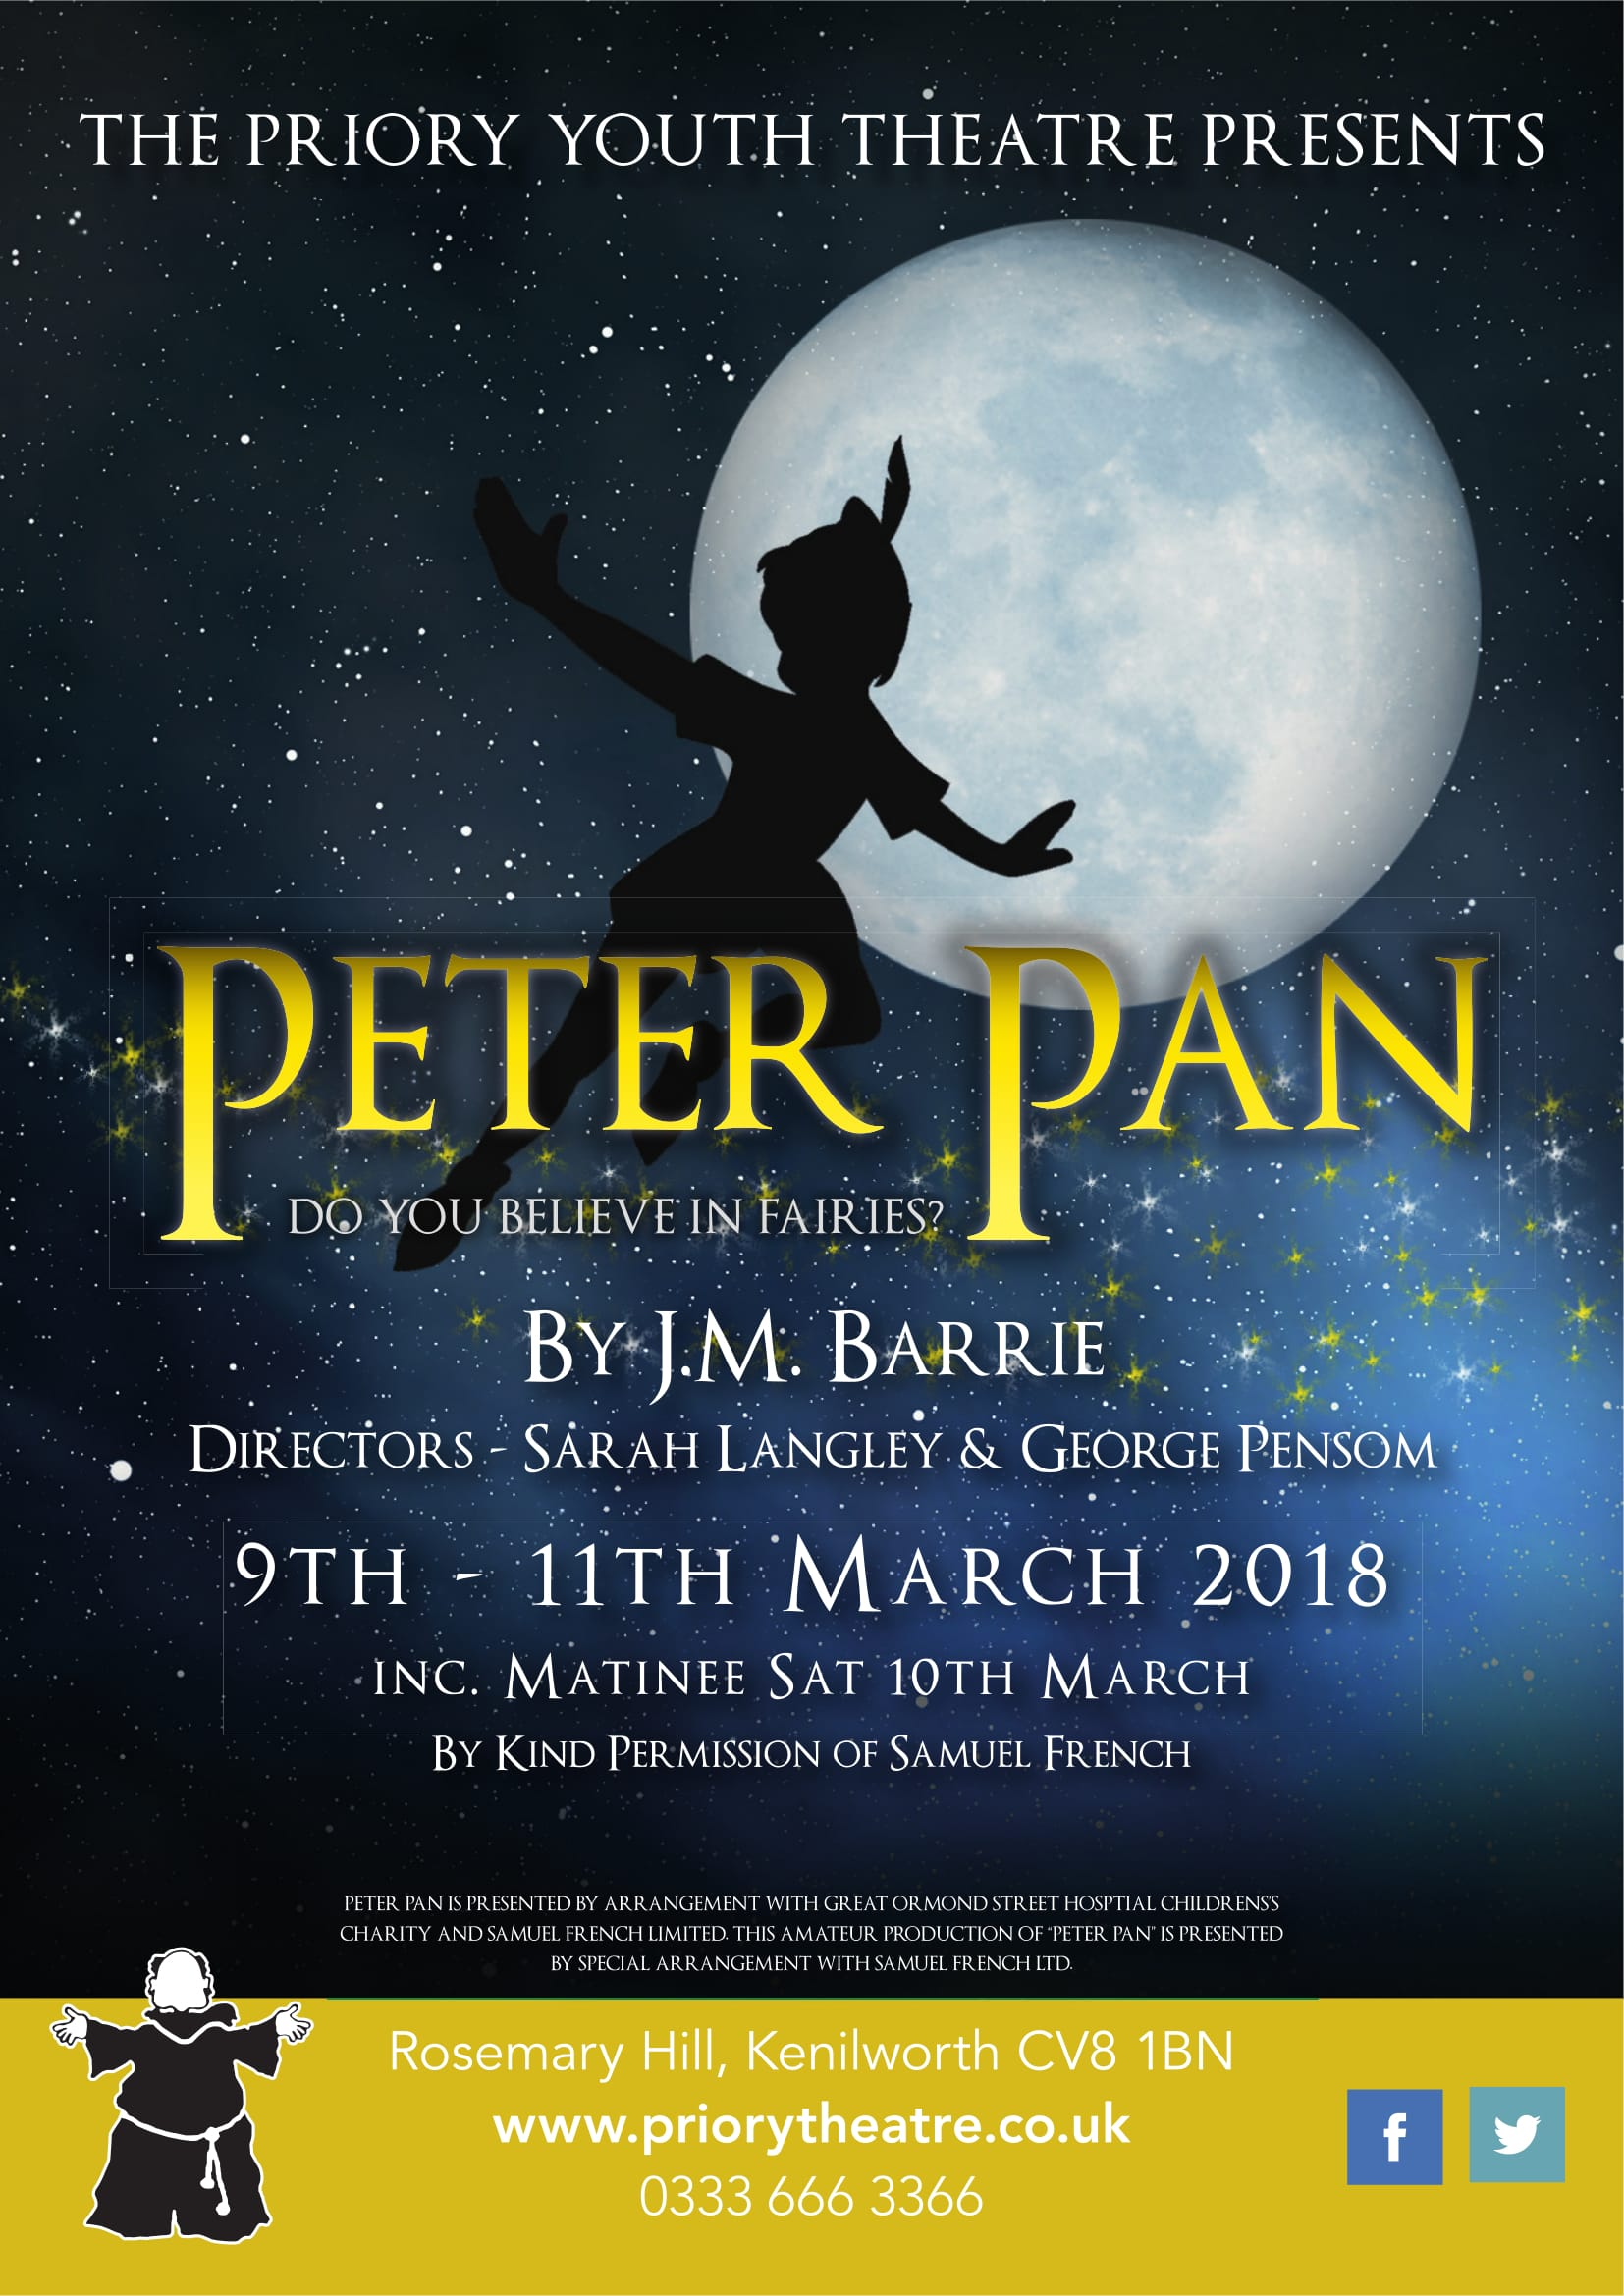 Peter Pan_A02-1.jpg